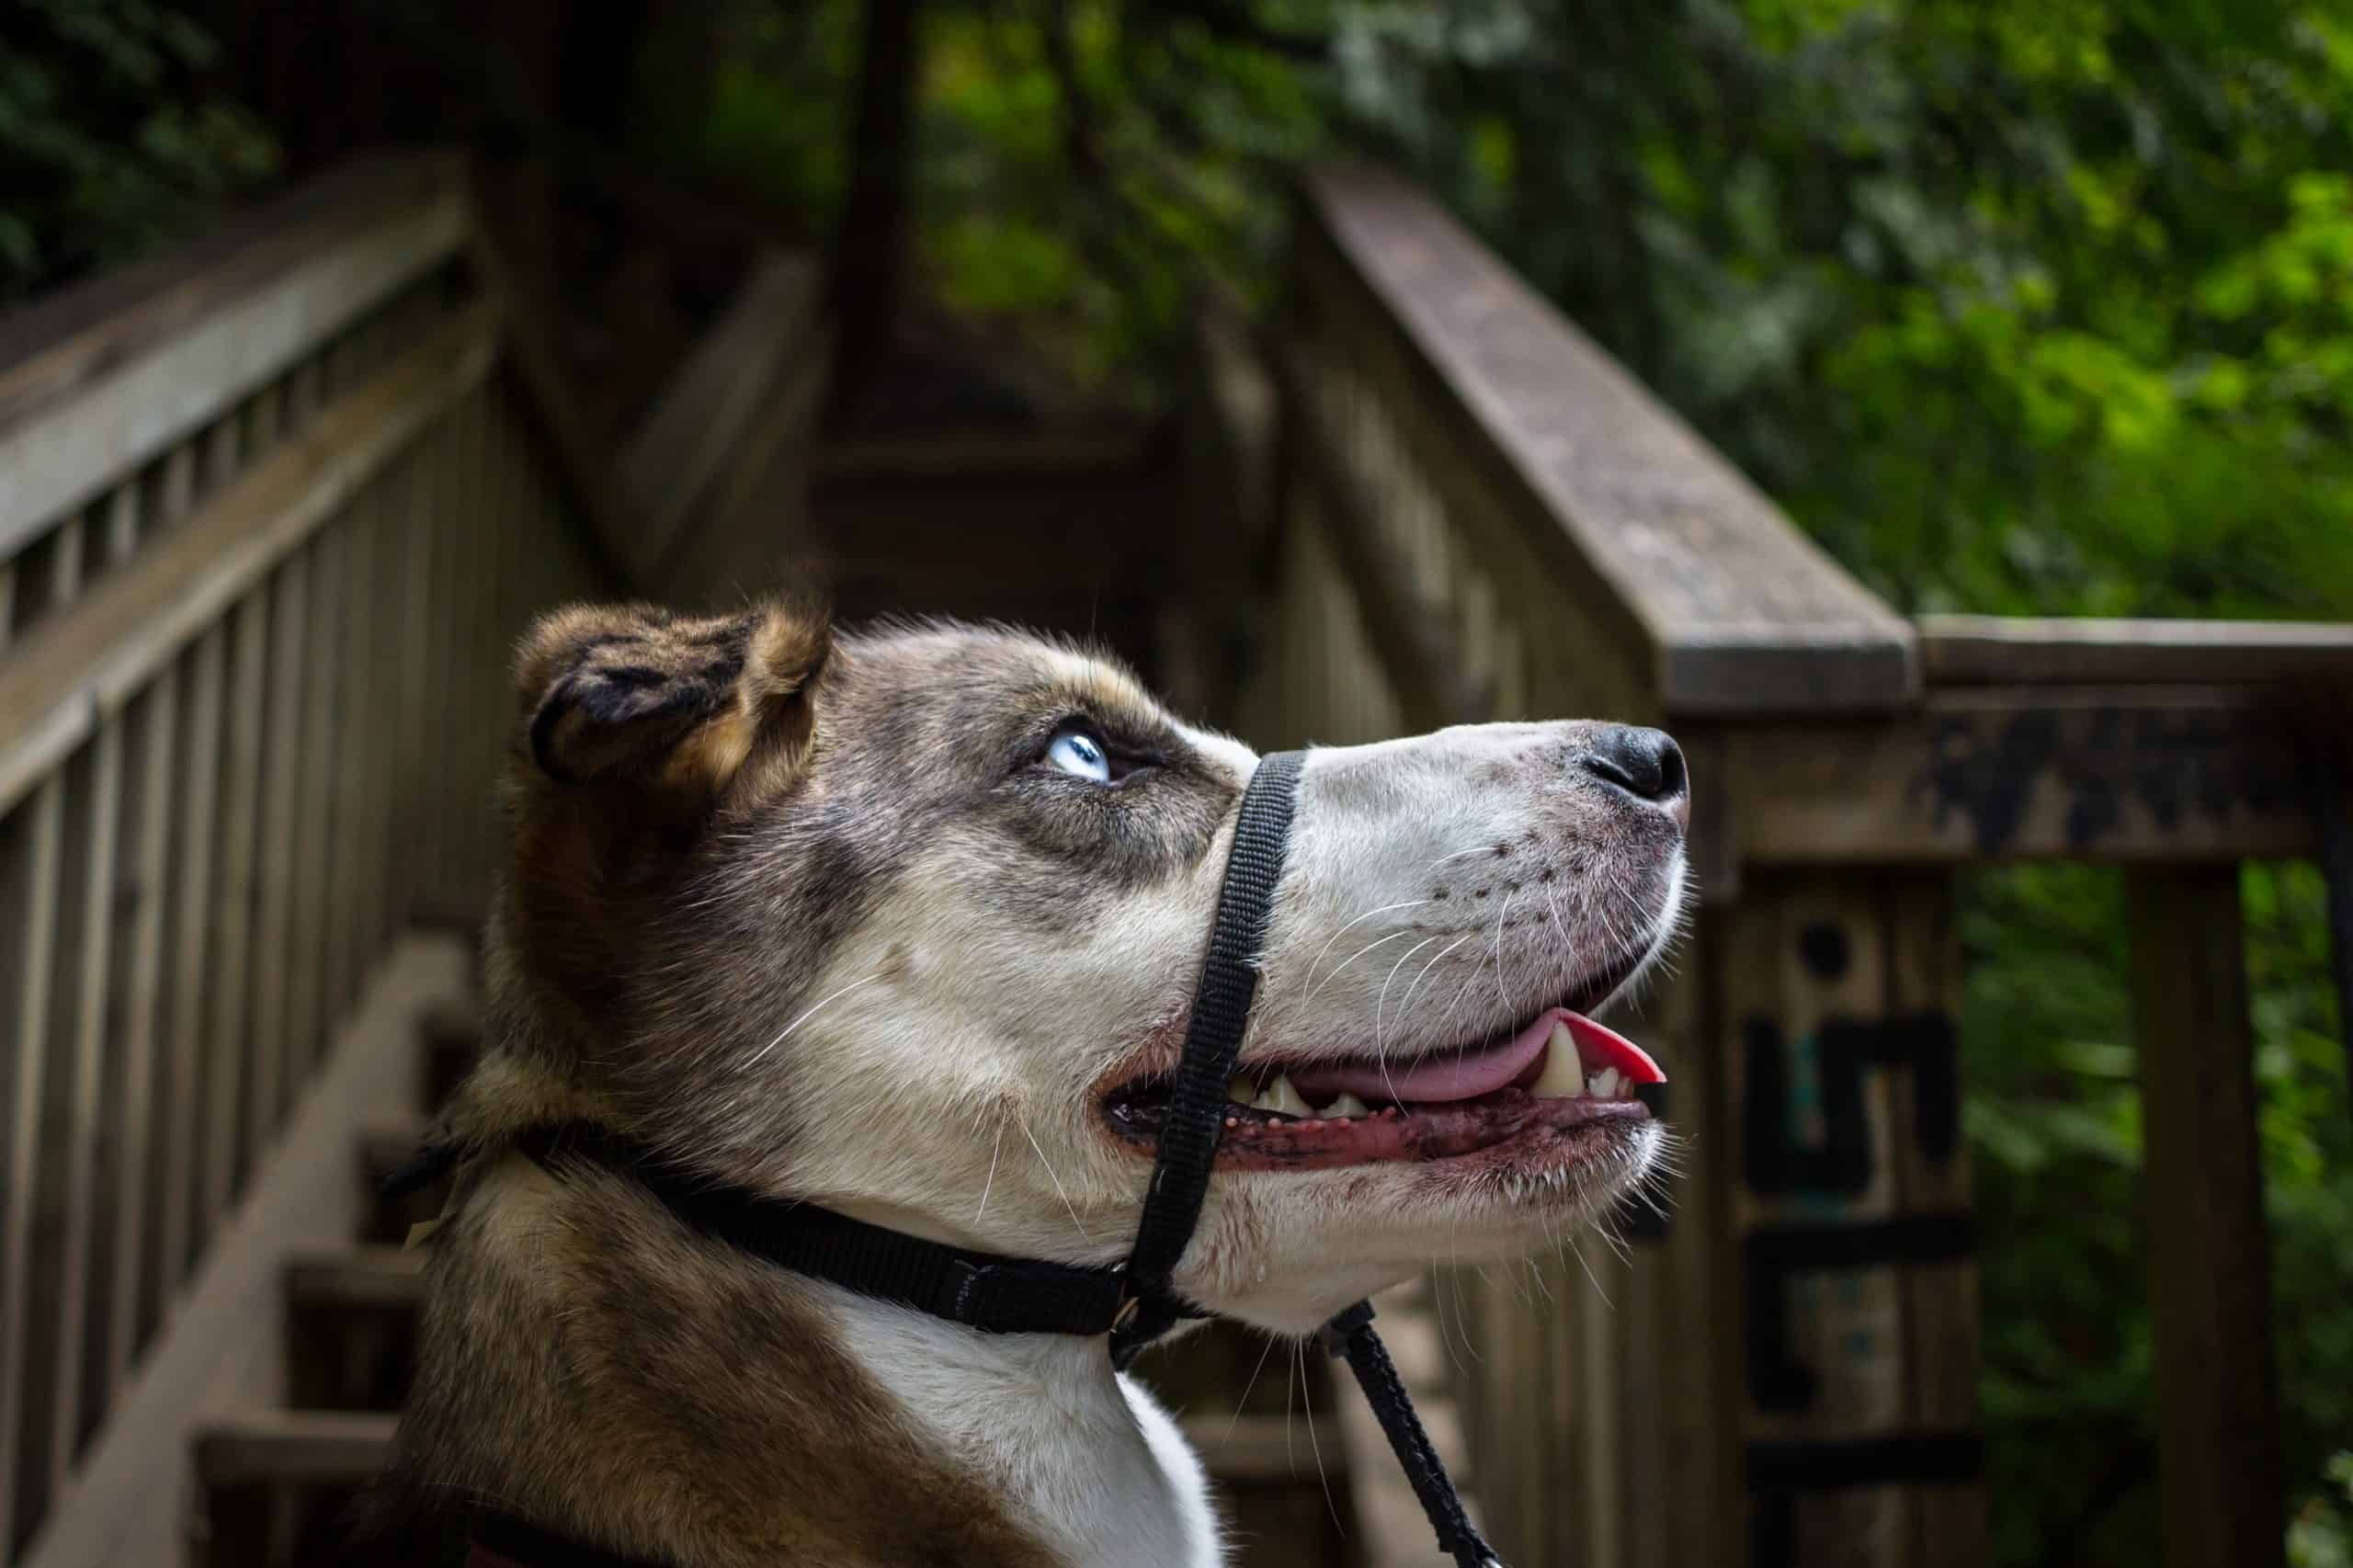 Husky Mix wearing a head halter outside